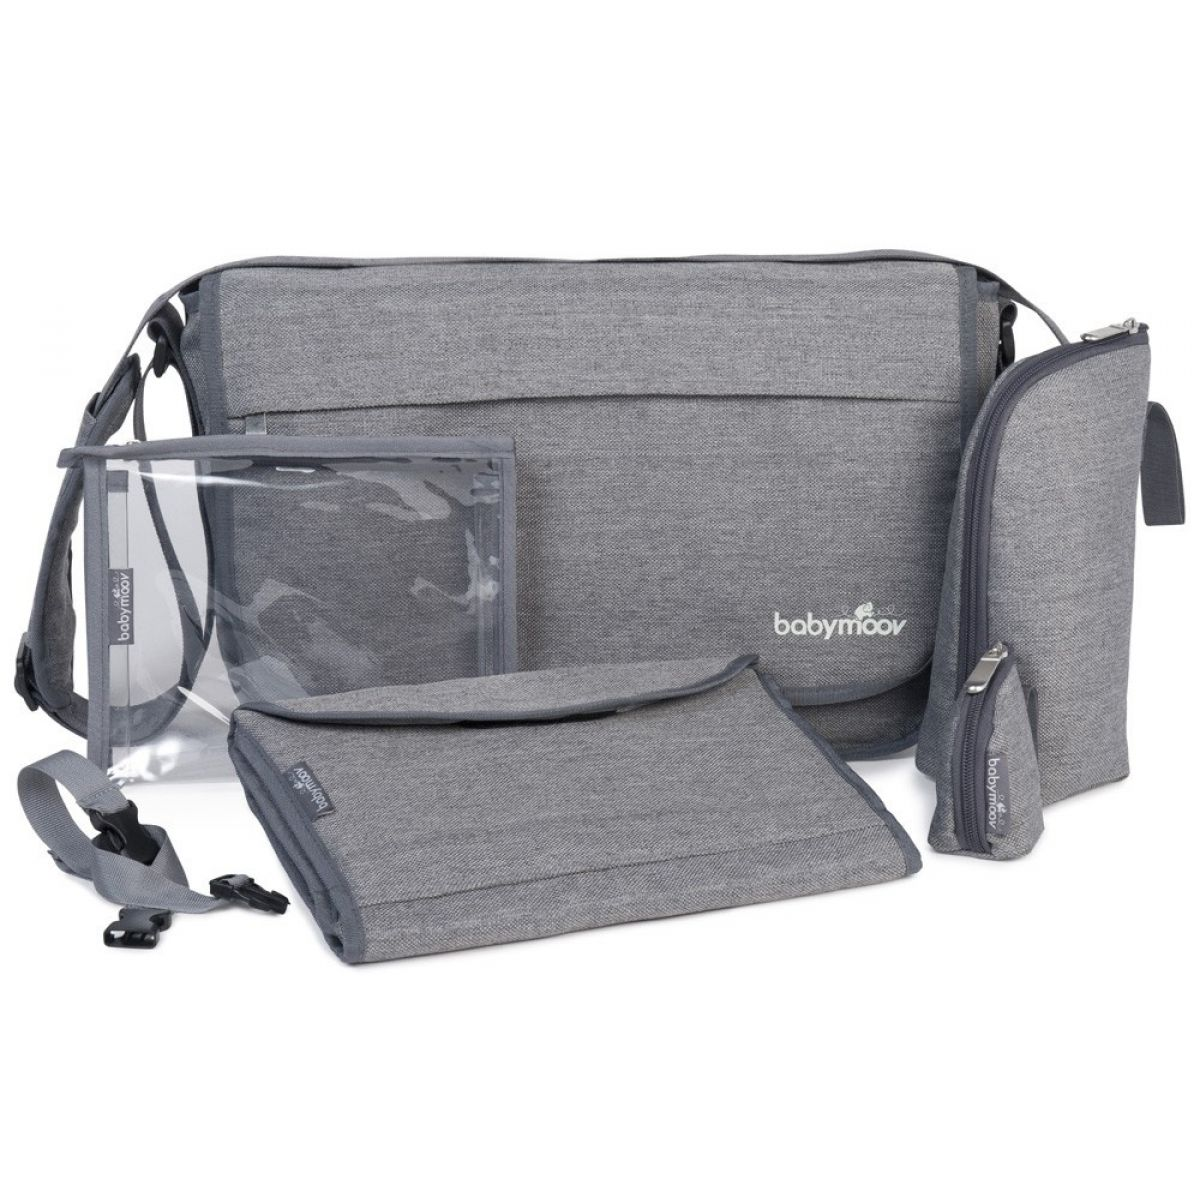 Babymoov Messenger Bag Smokey sivá